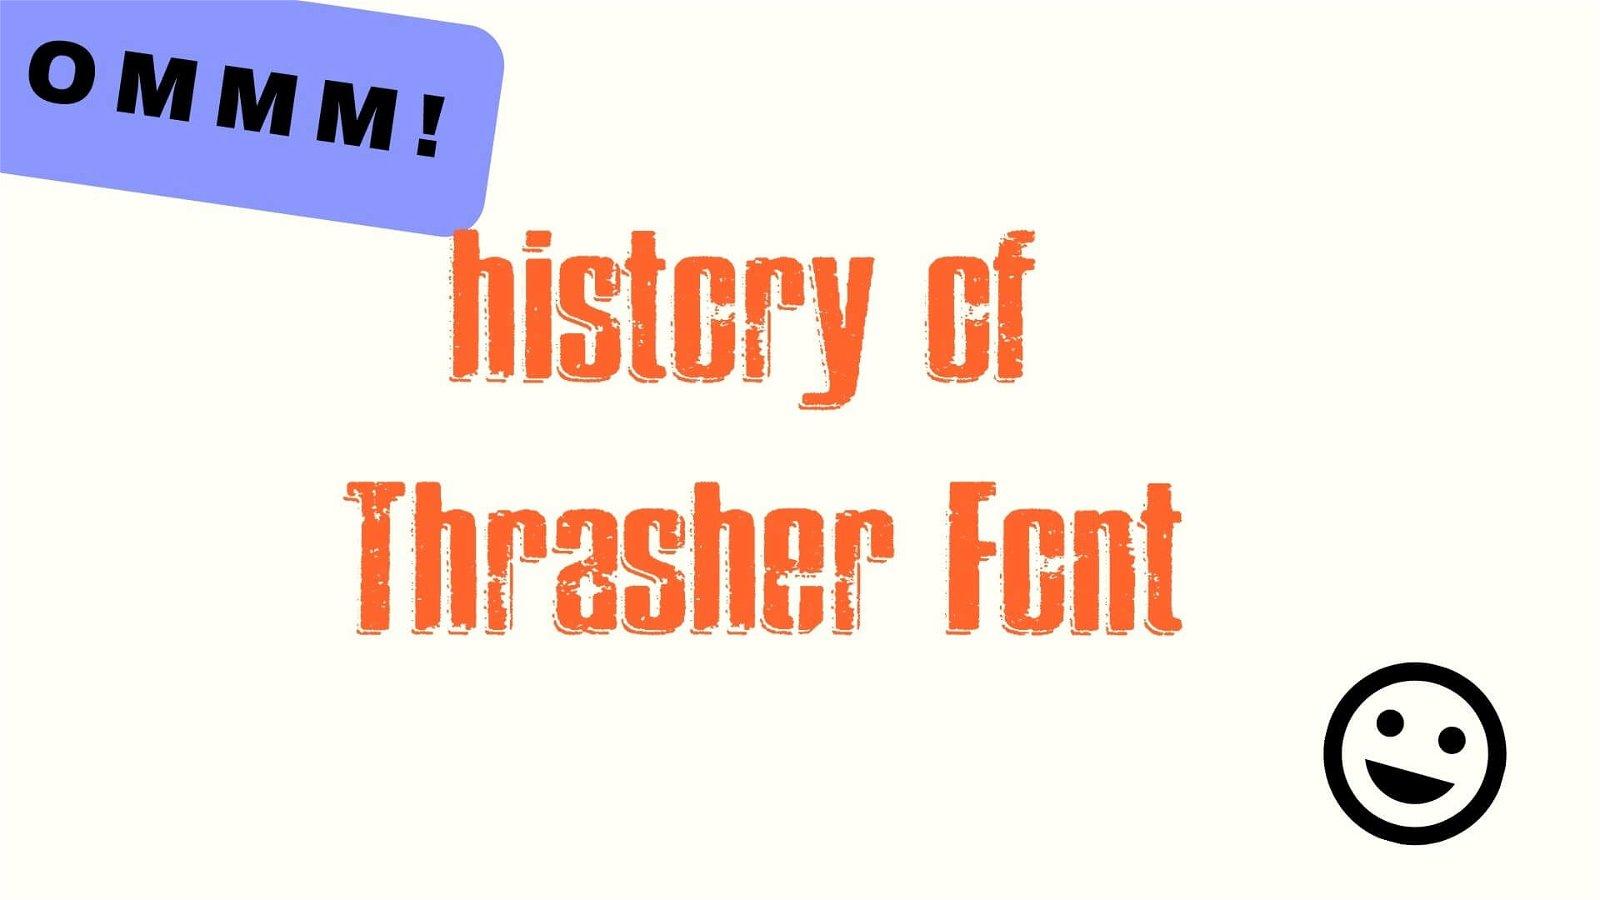 History of Thrasher Font